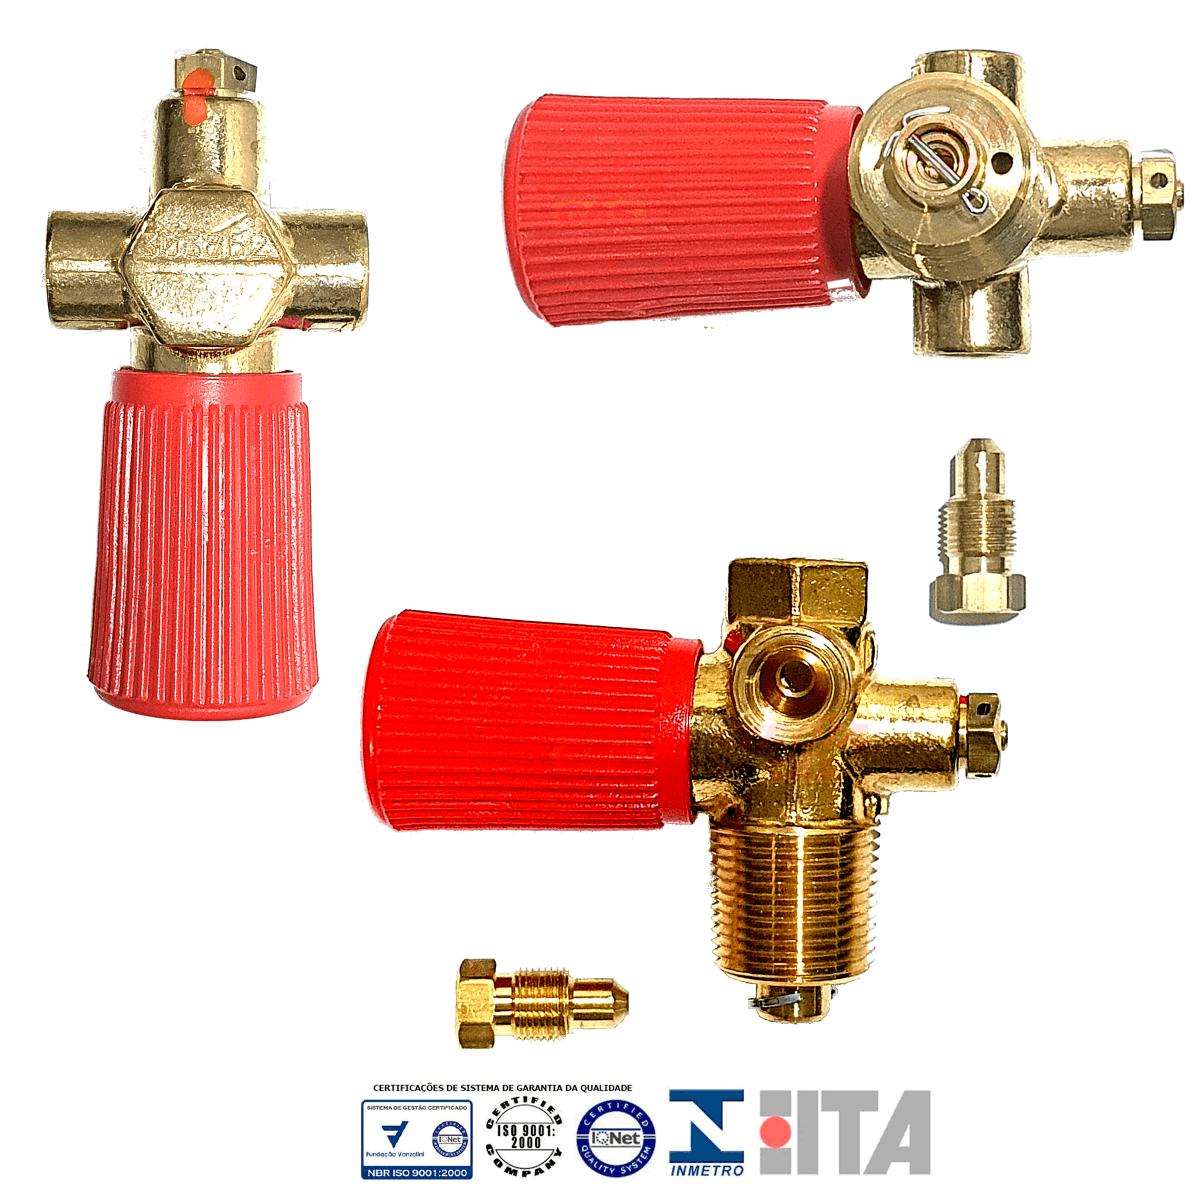 Kit 3 Válvulas GNV ITA Cilindro com 2 Válvulas de Segurança INMETRO